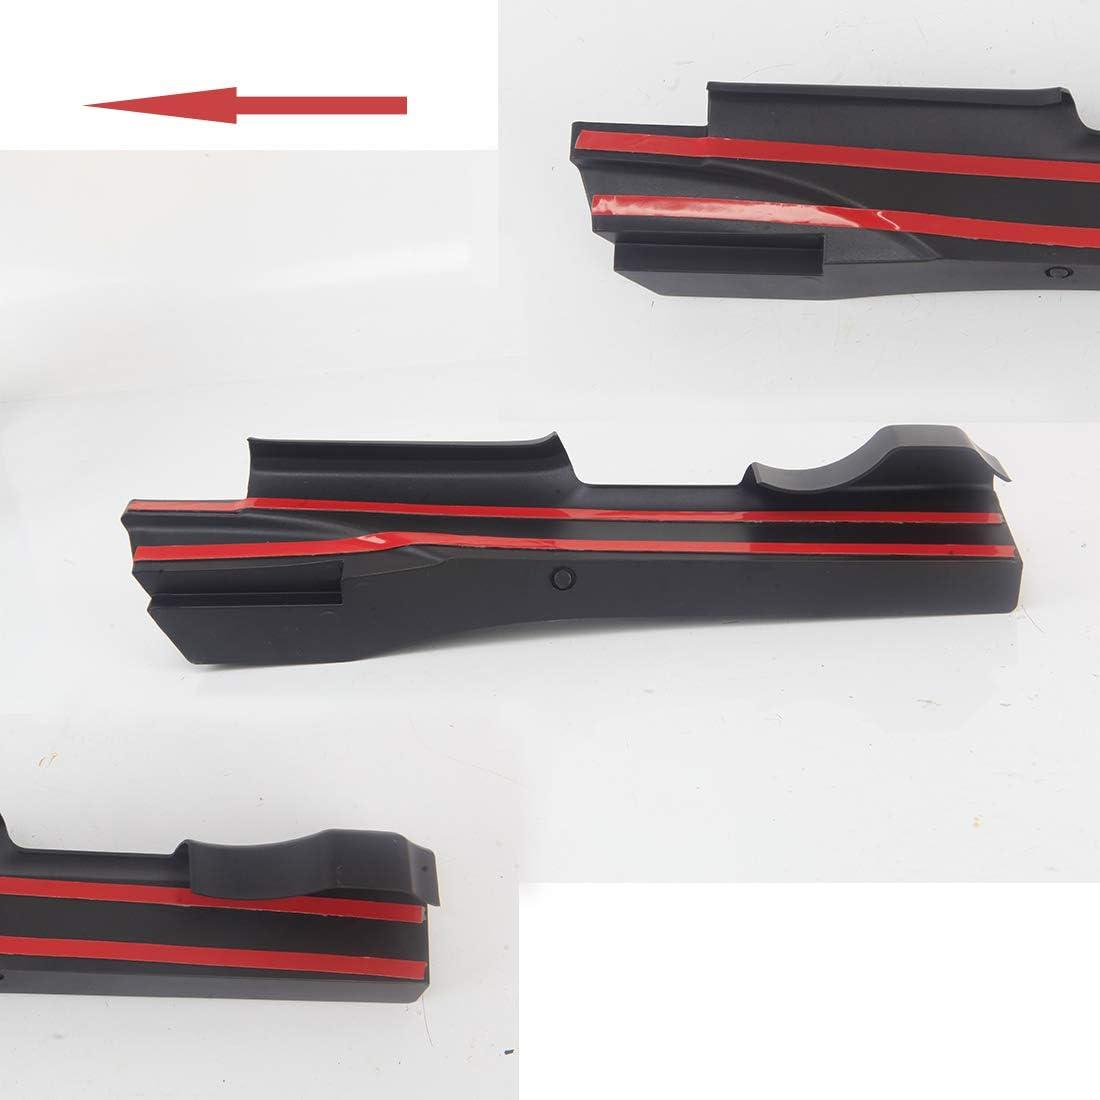 Interior Accessories Black KMFCDAE Geartray Passenger Seat Organizer Front Seat Gap Filler Gear Shifter Console Side Storage Box Tray for Jeep Wrangler JK JKU2011-2018